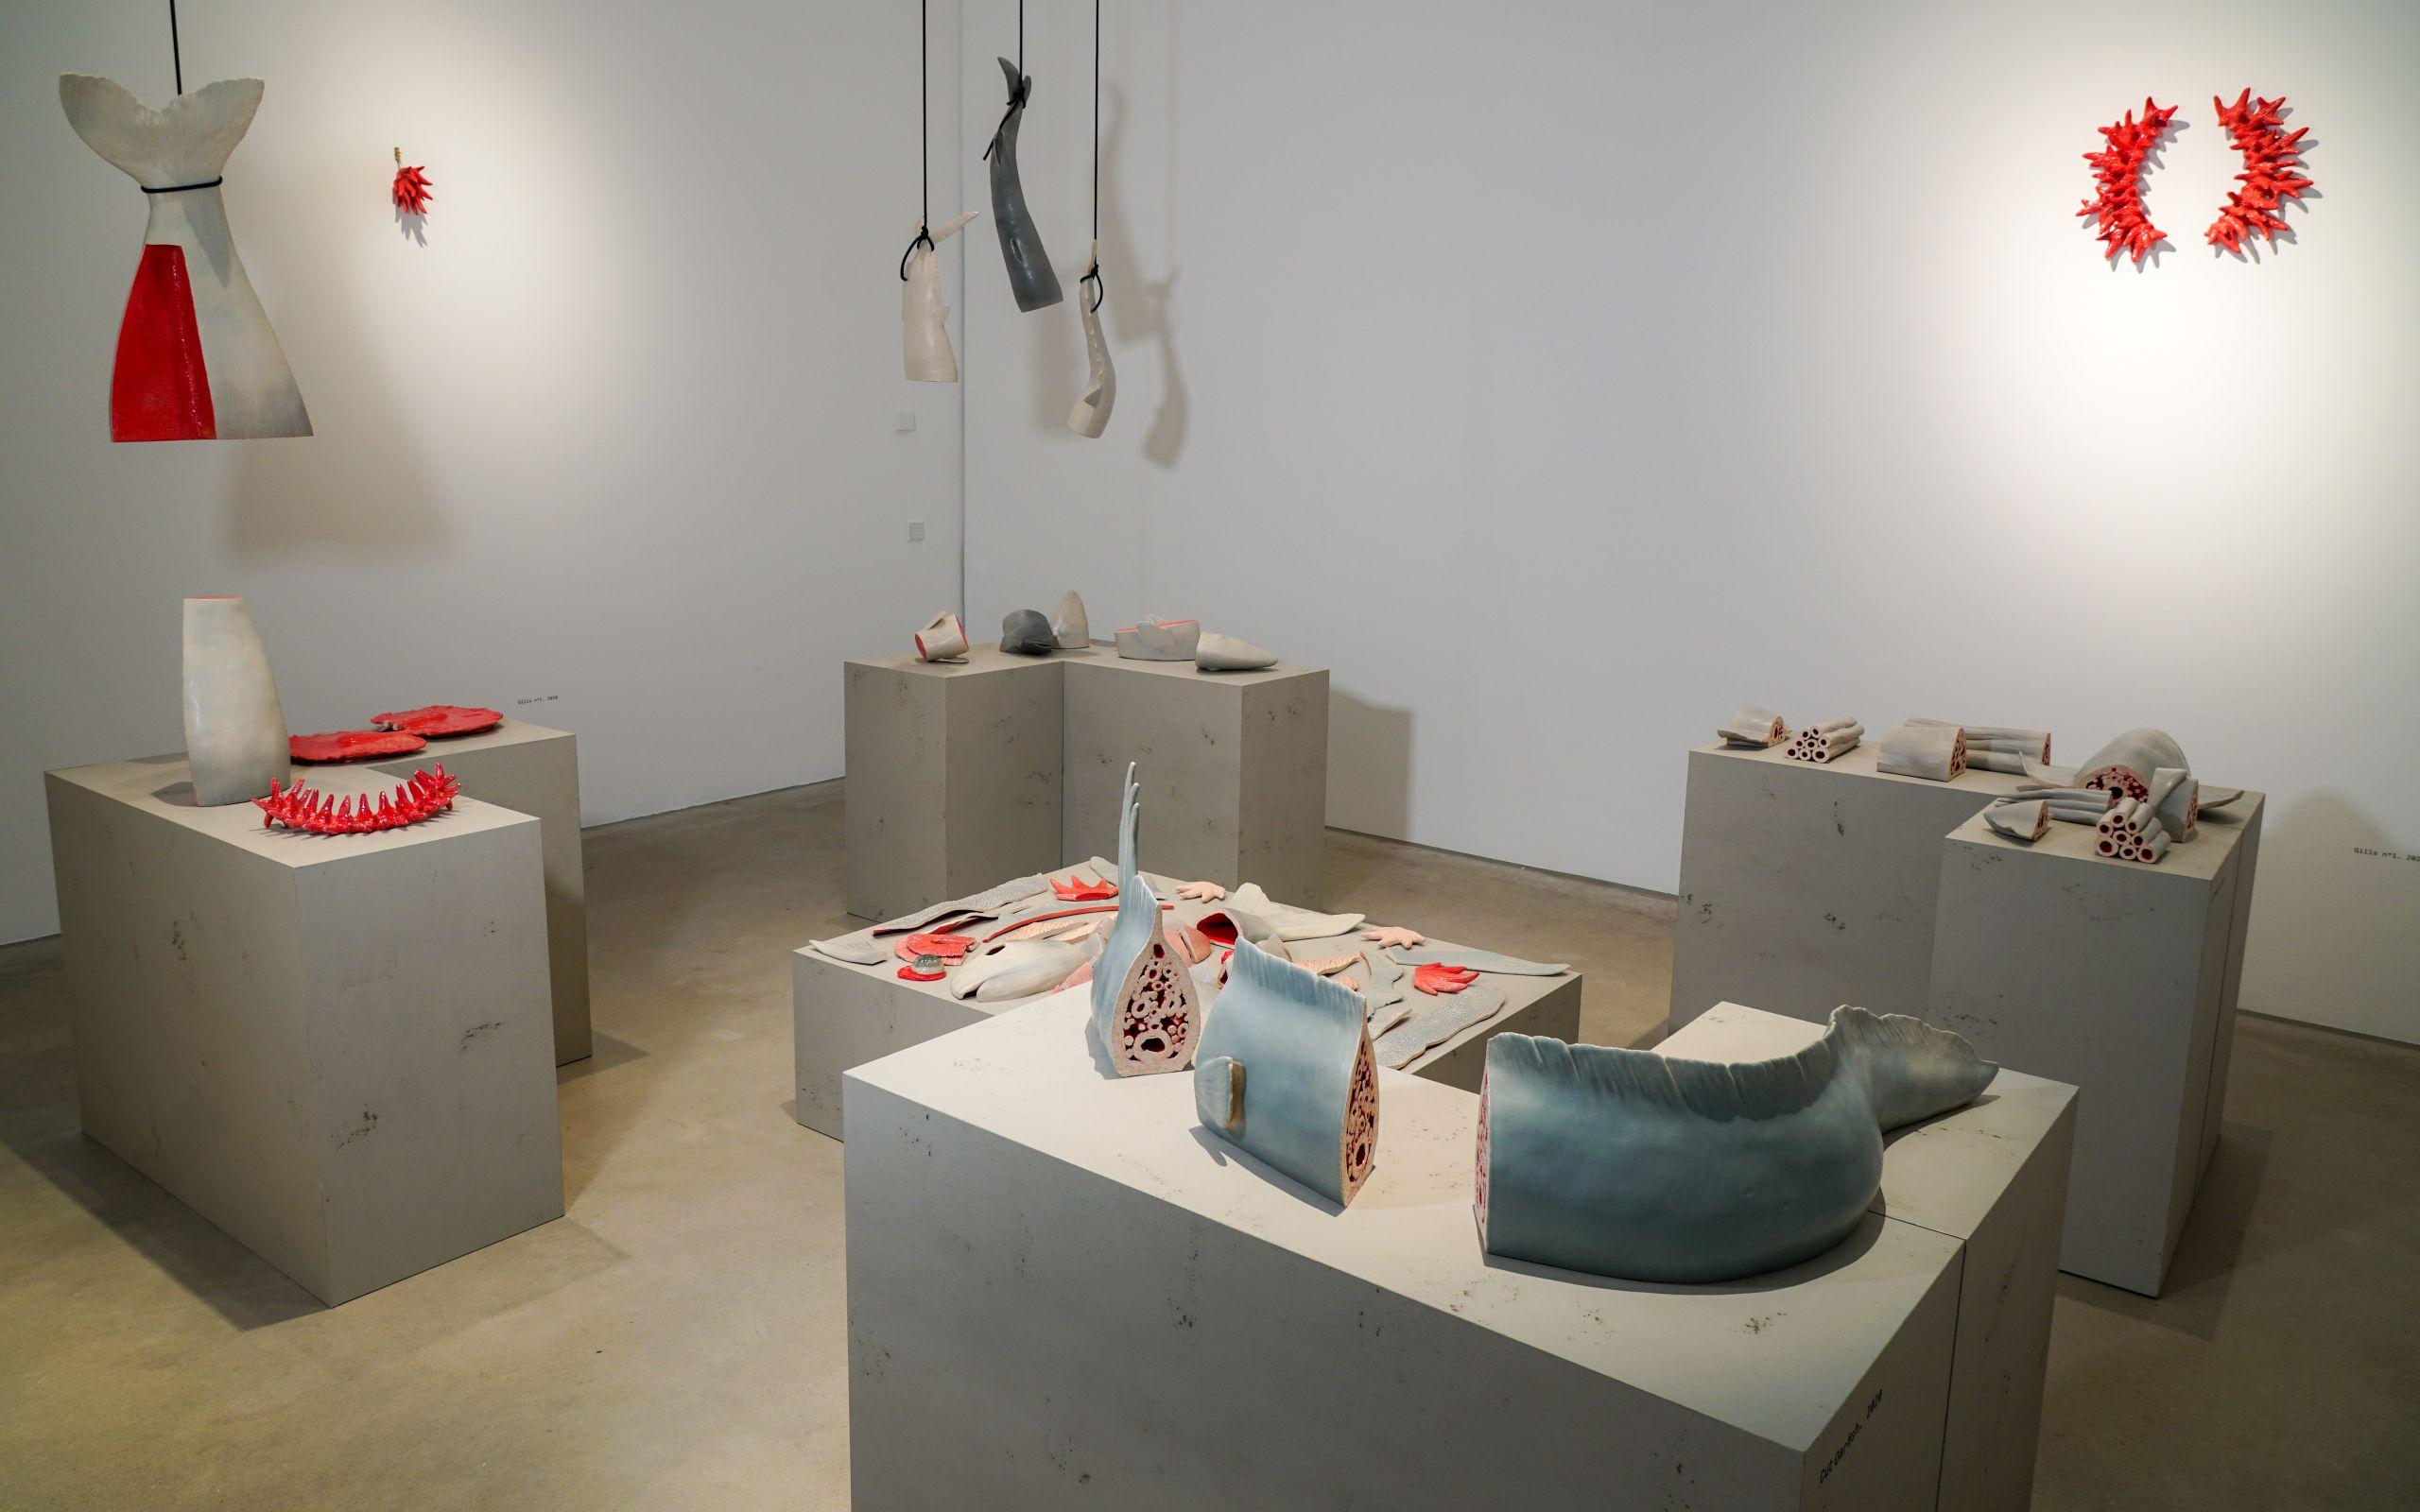 Elsa Guillaume, Installationsansichten, Foto: Kunsthalle Mannheim © Elsa Guillaume, VG Bild-Kunst 2020